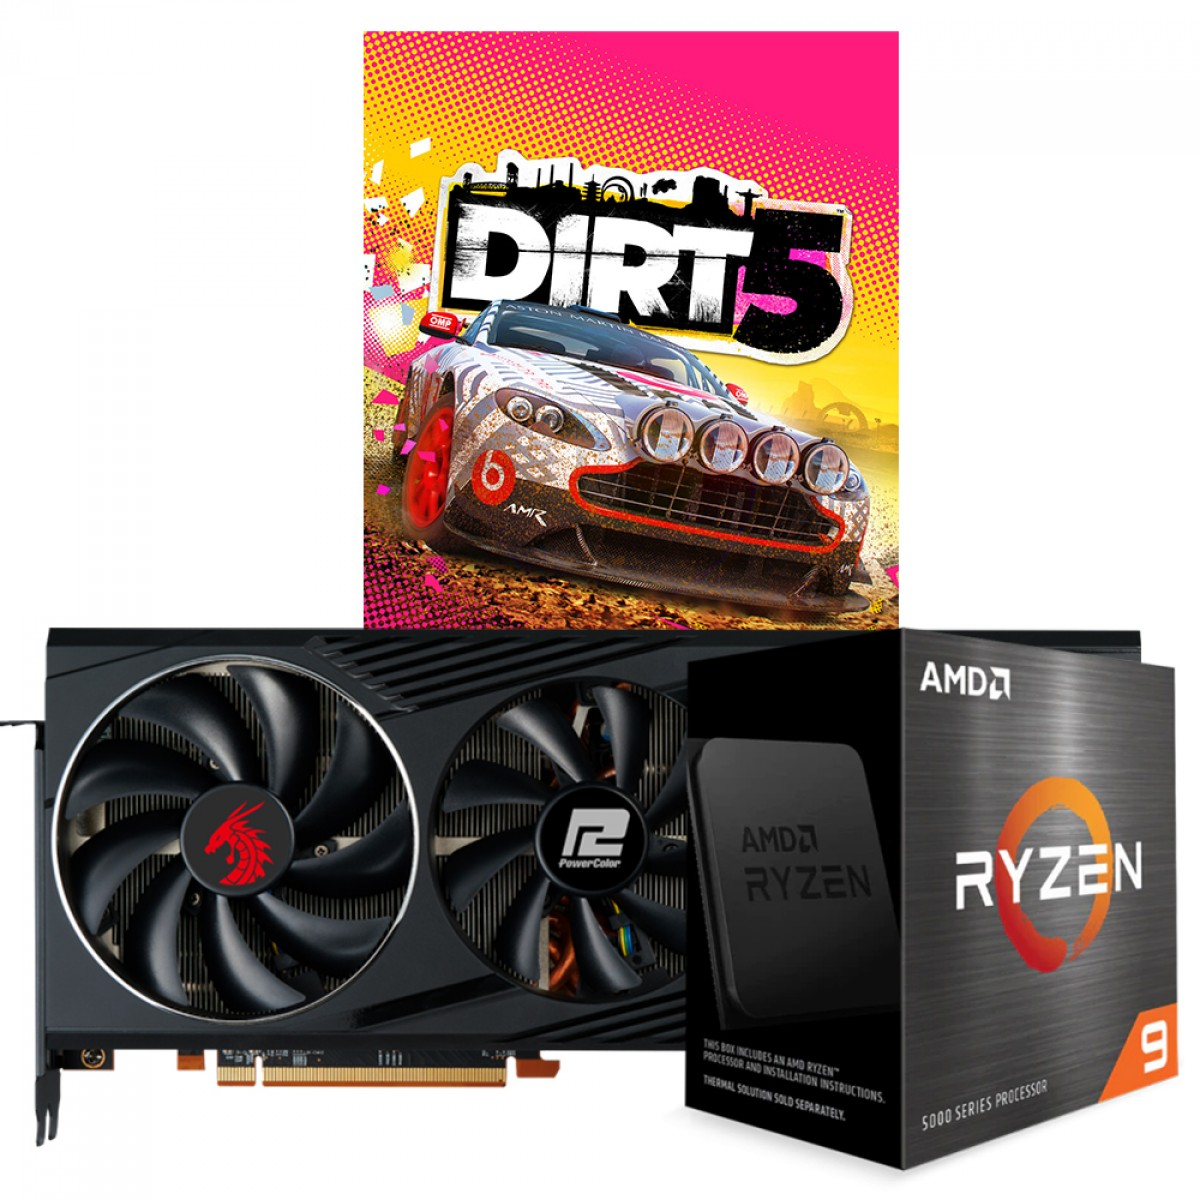 Kit Upgrade PowerColor Radeon RX 6800 Red Dragon + AMD Ryzen 9 5950X + Brinde Jogo Dirt 5